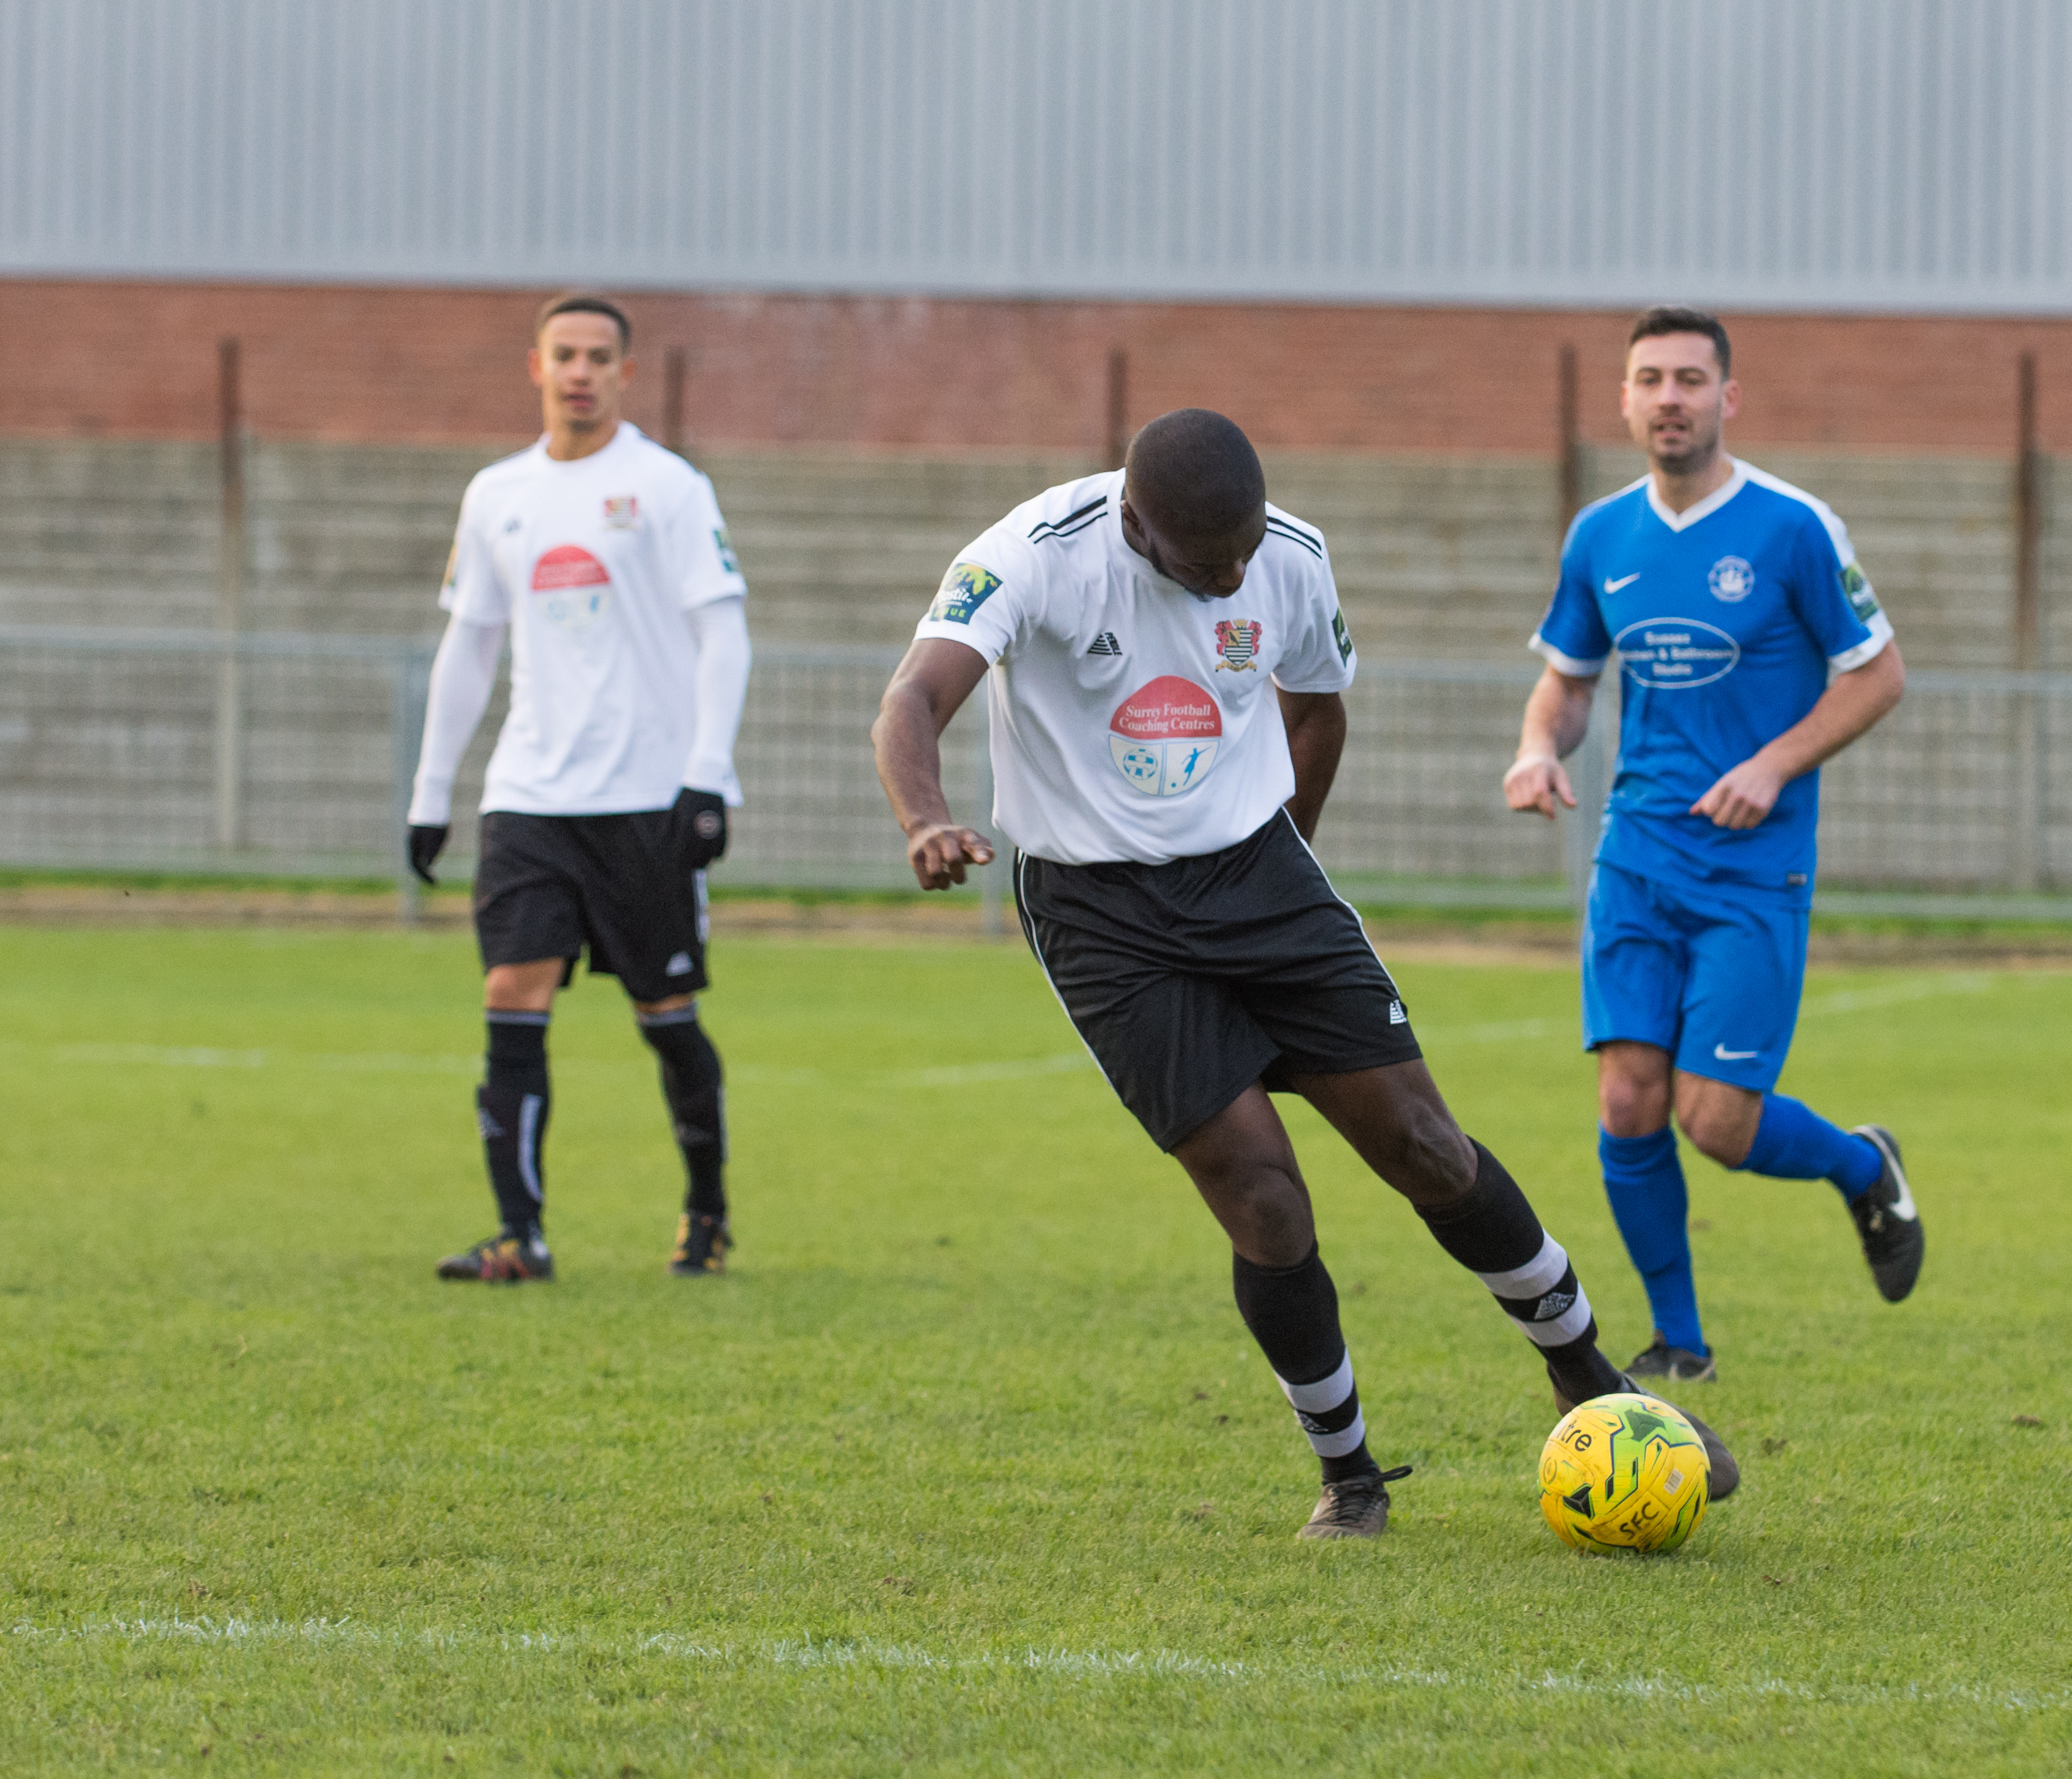 Shoreham FC vs Molesey FC 02.12.17 41